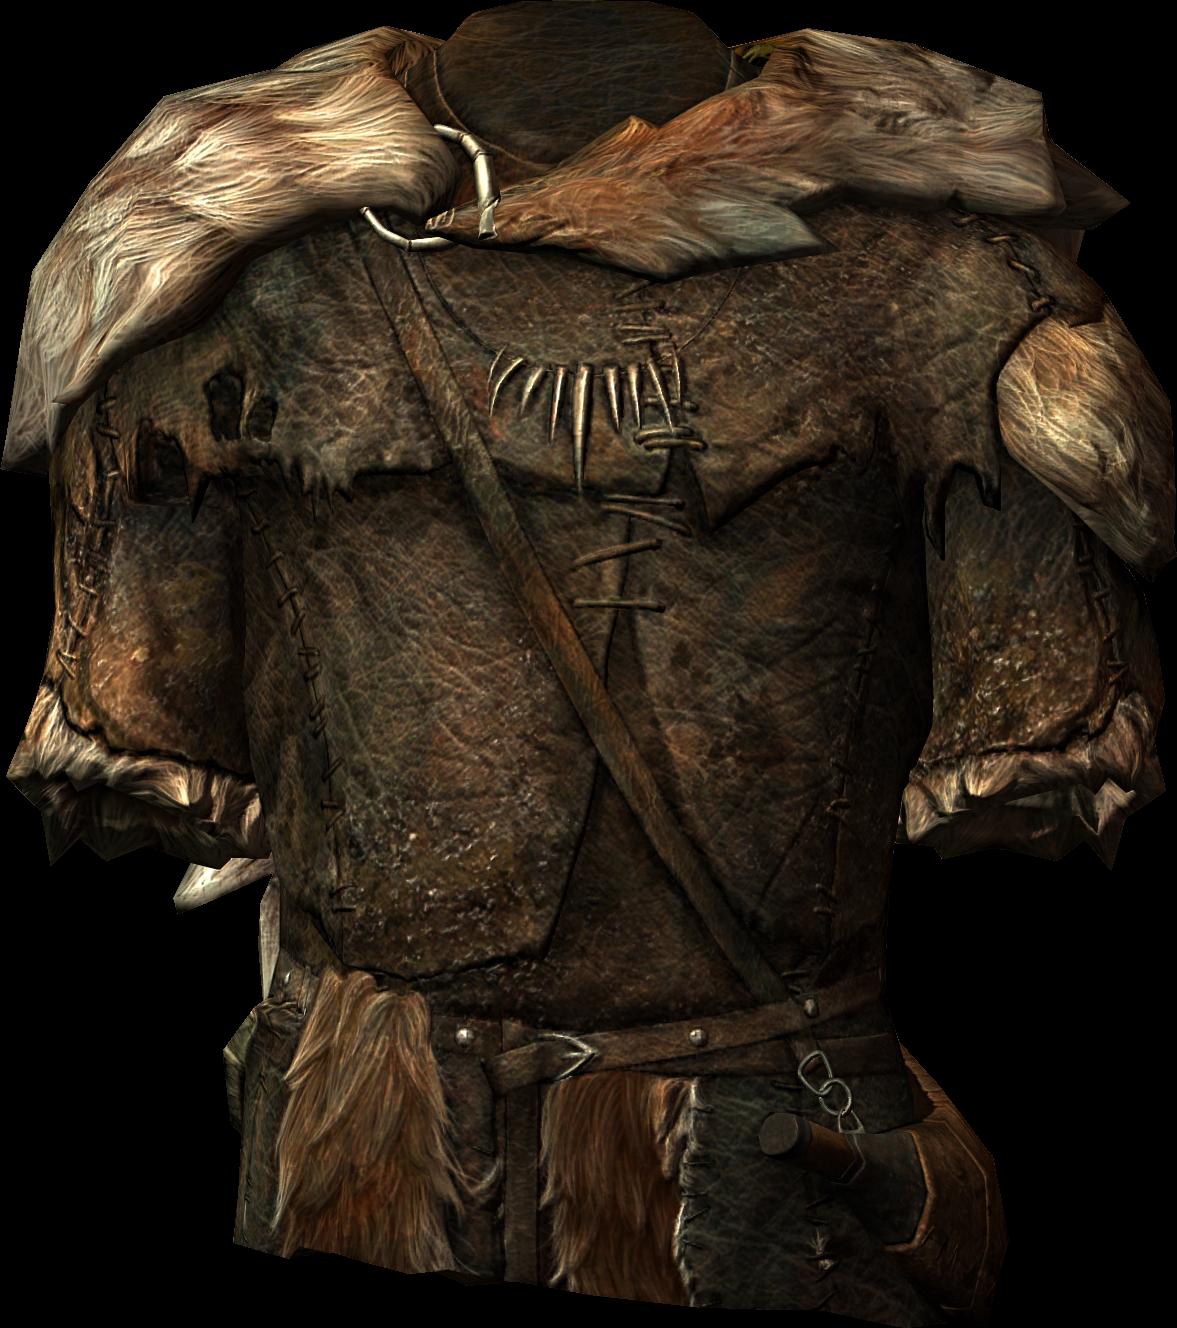 http://img2.wikia.nocookie.net/__cb20121010224131/elderscrolls/images/3/39/Fur_armor_0006f393.png